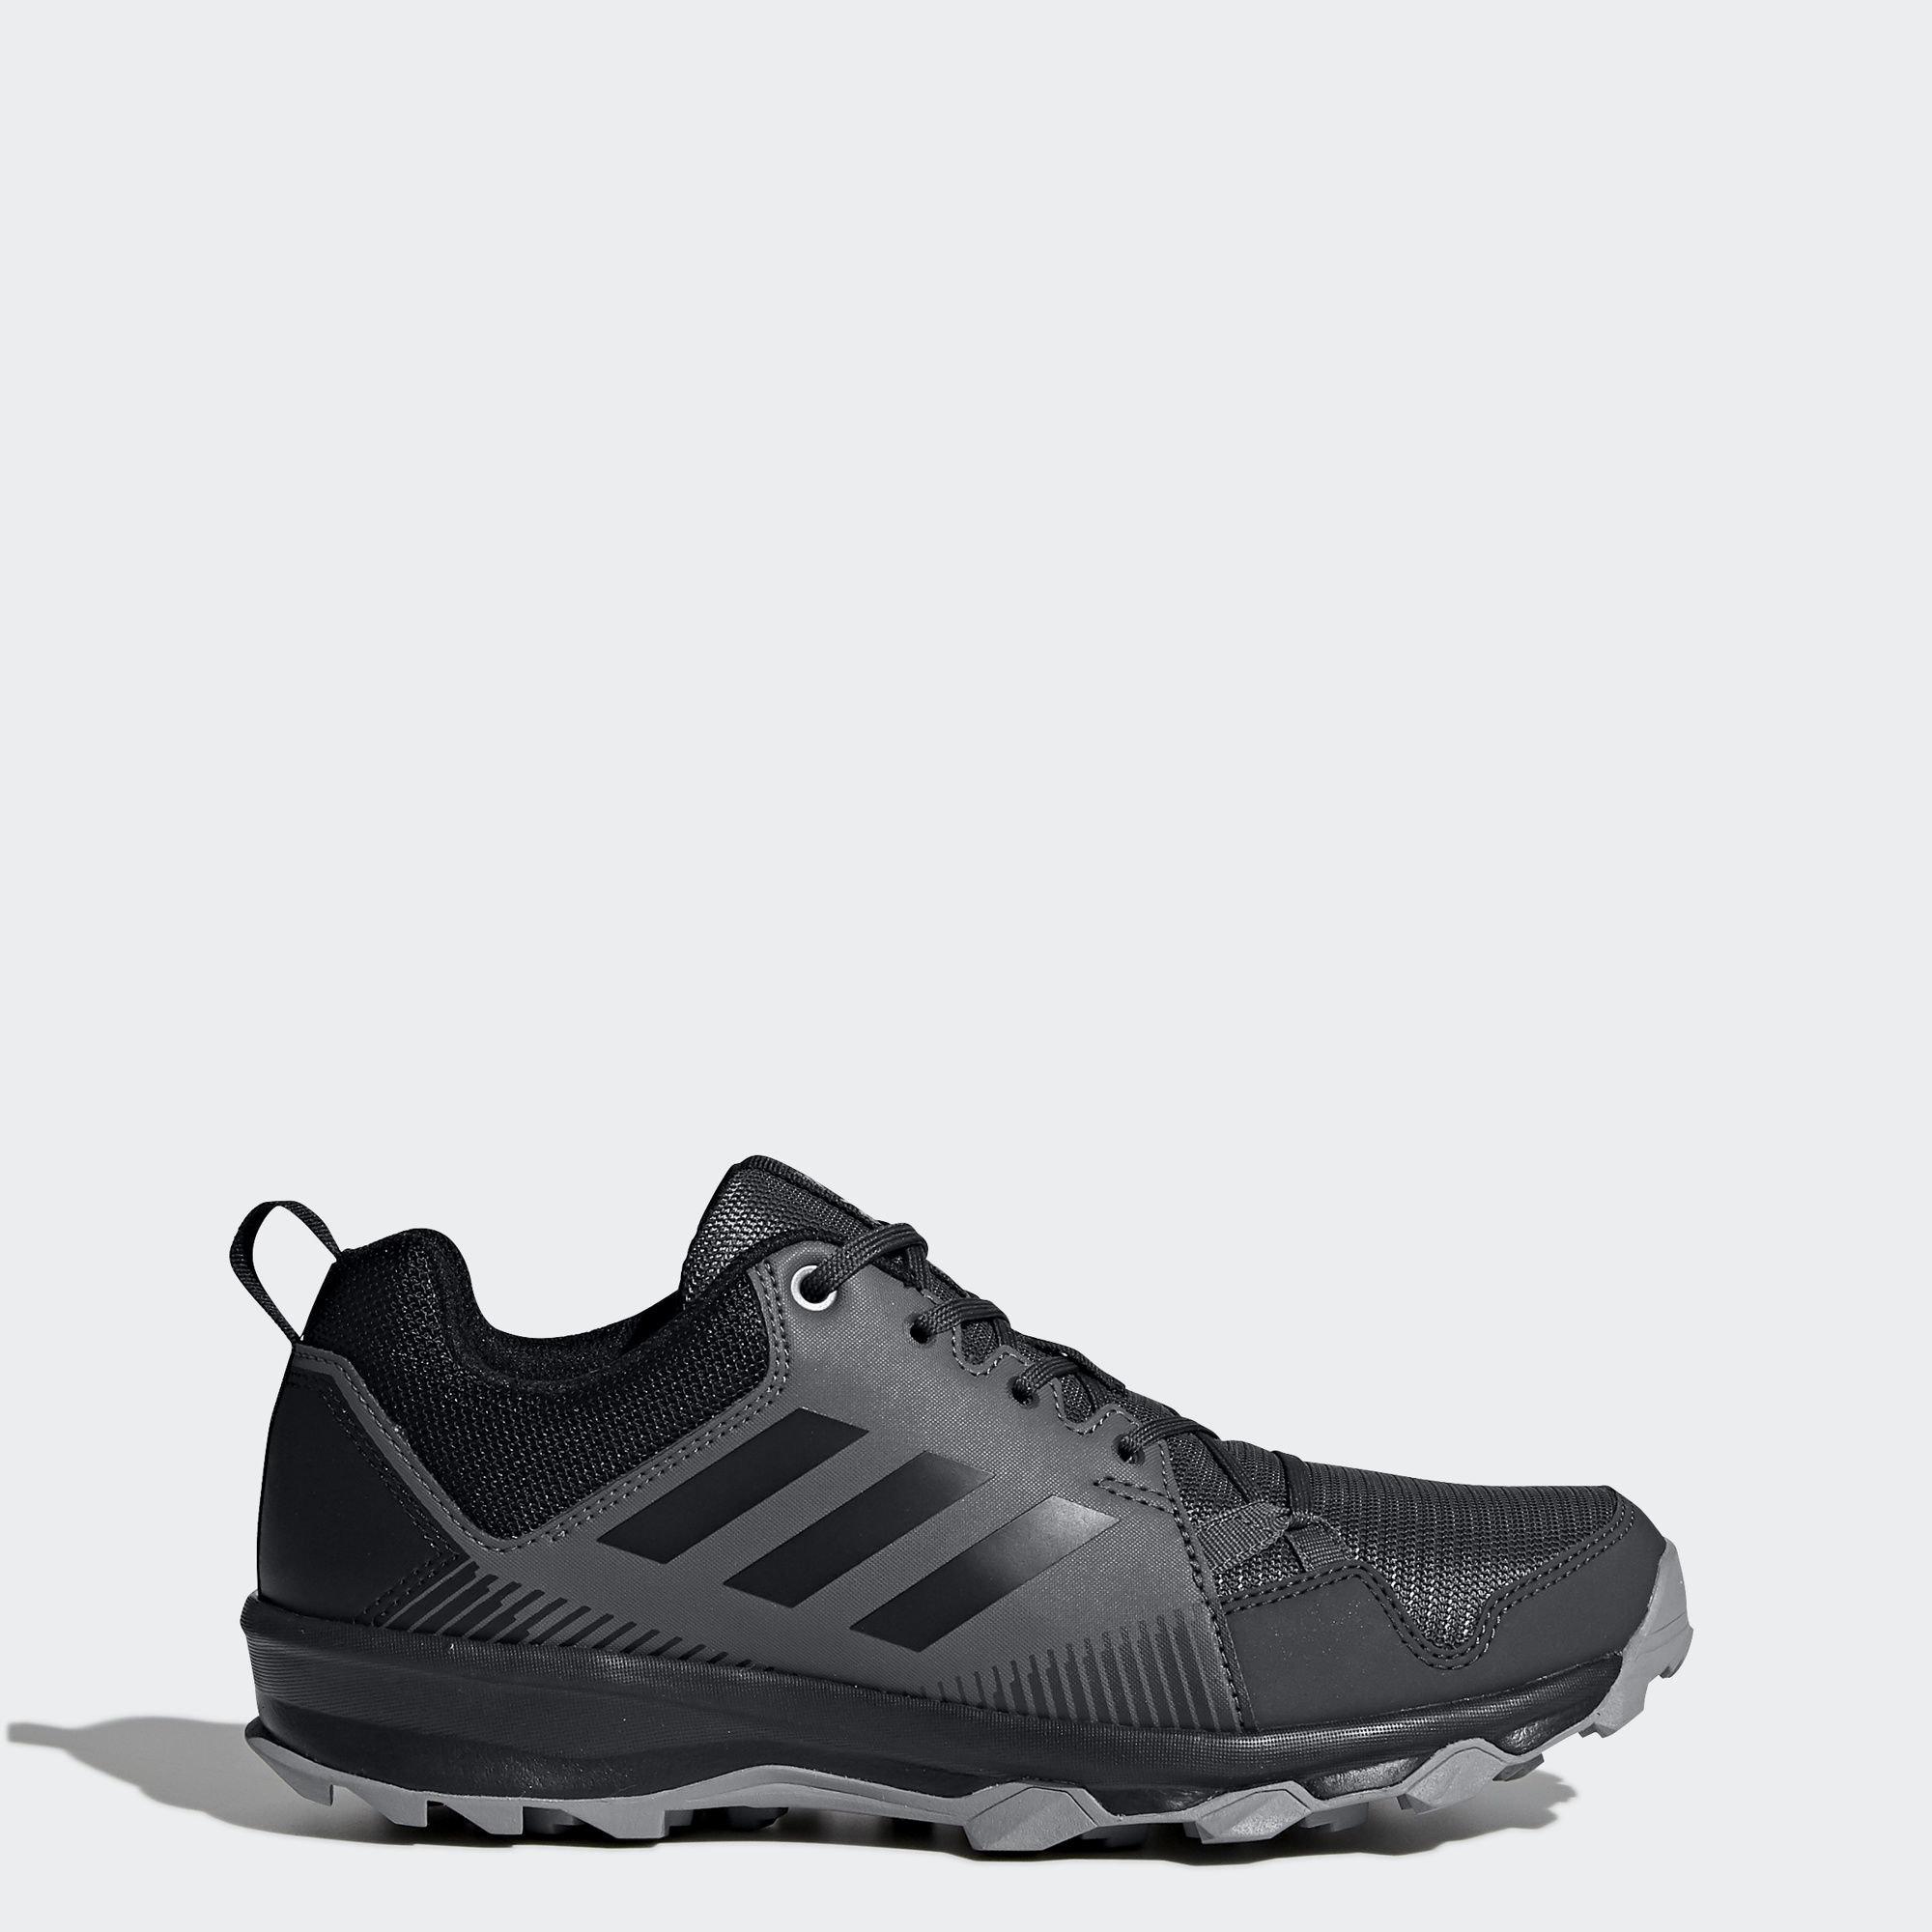 Обувь для трейлраннинга TERREX Tracerocker adidas TERREX Black Five/Core Black/Utility Black